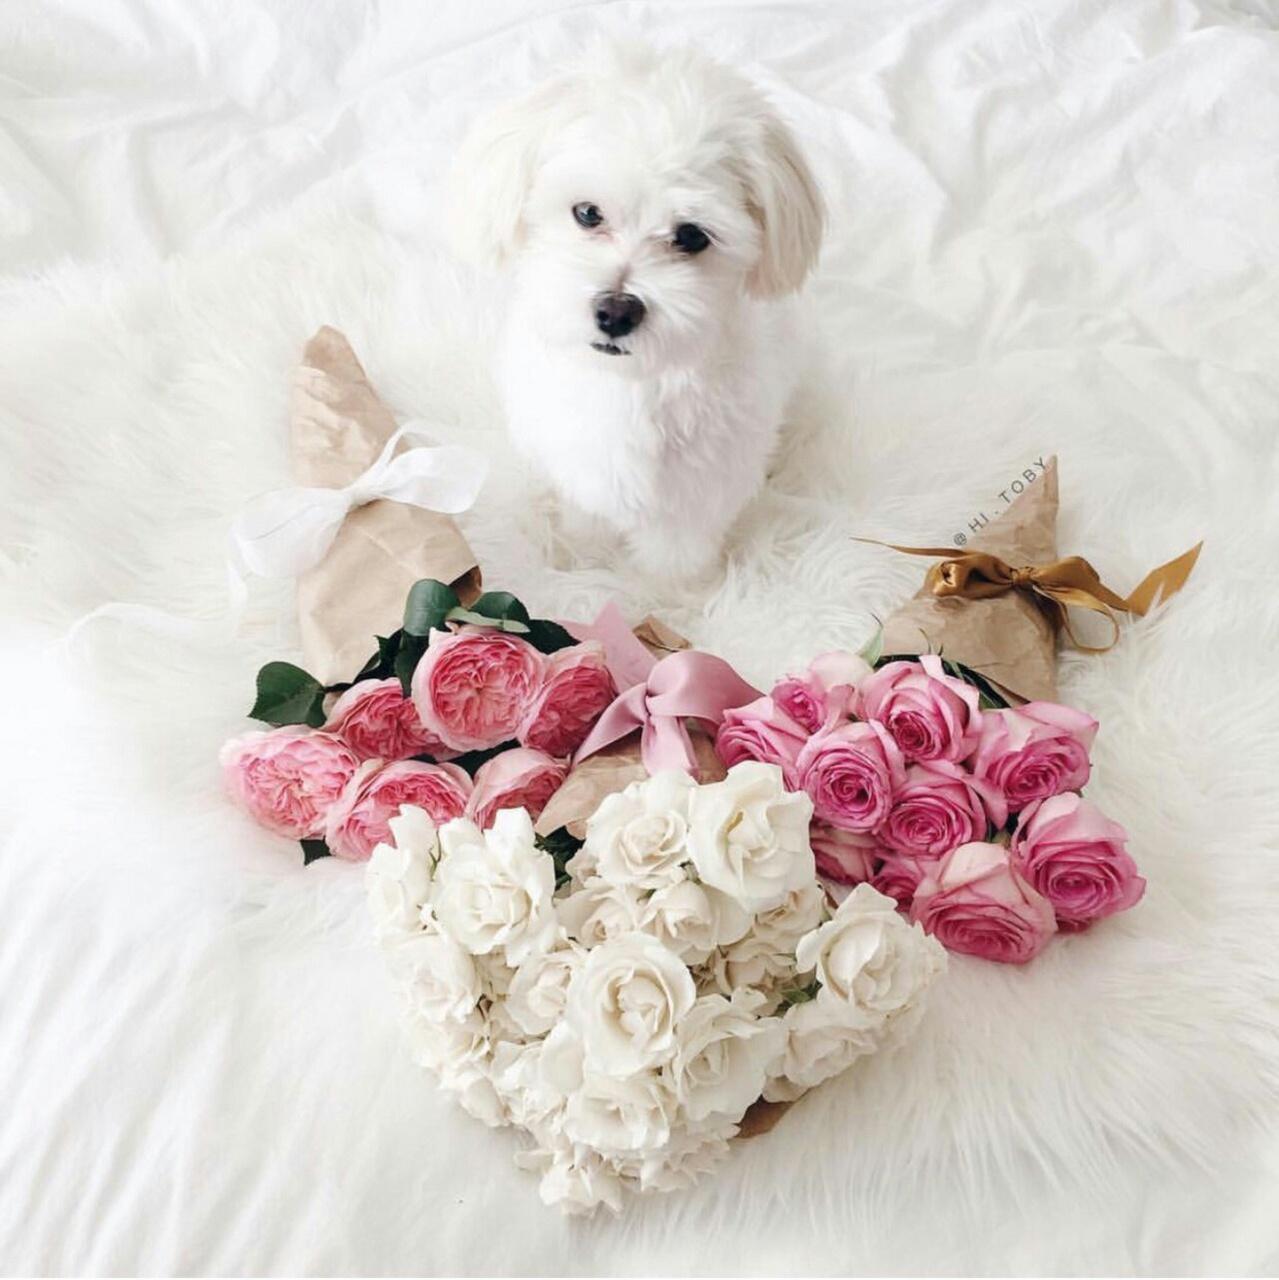 Фото щенка с розой